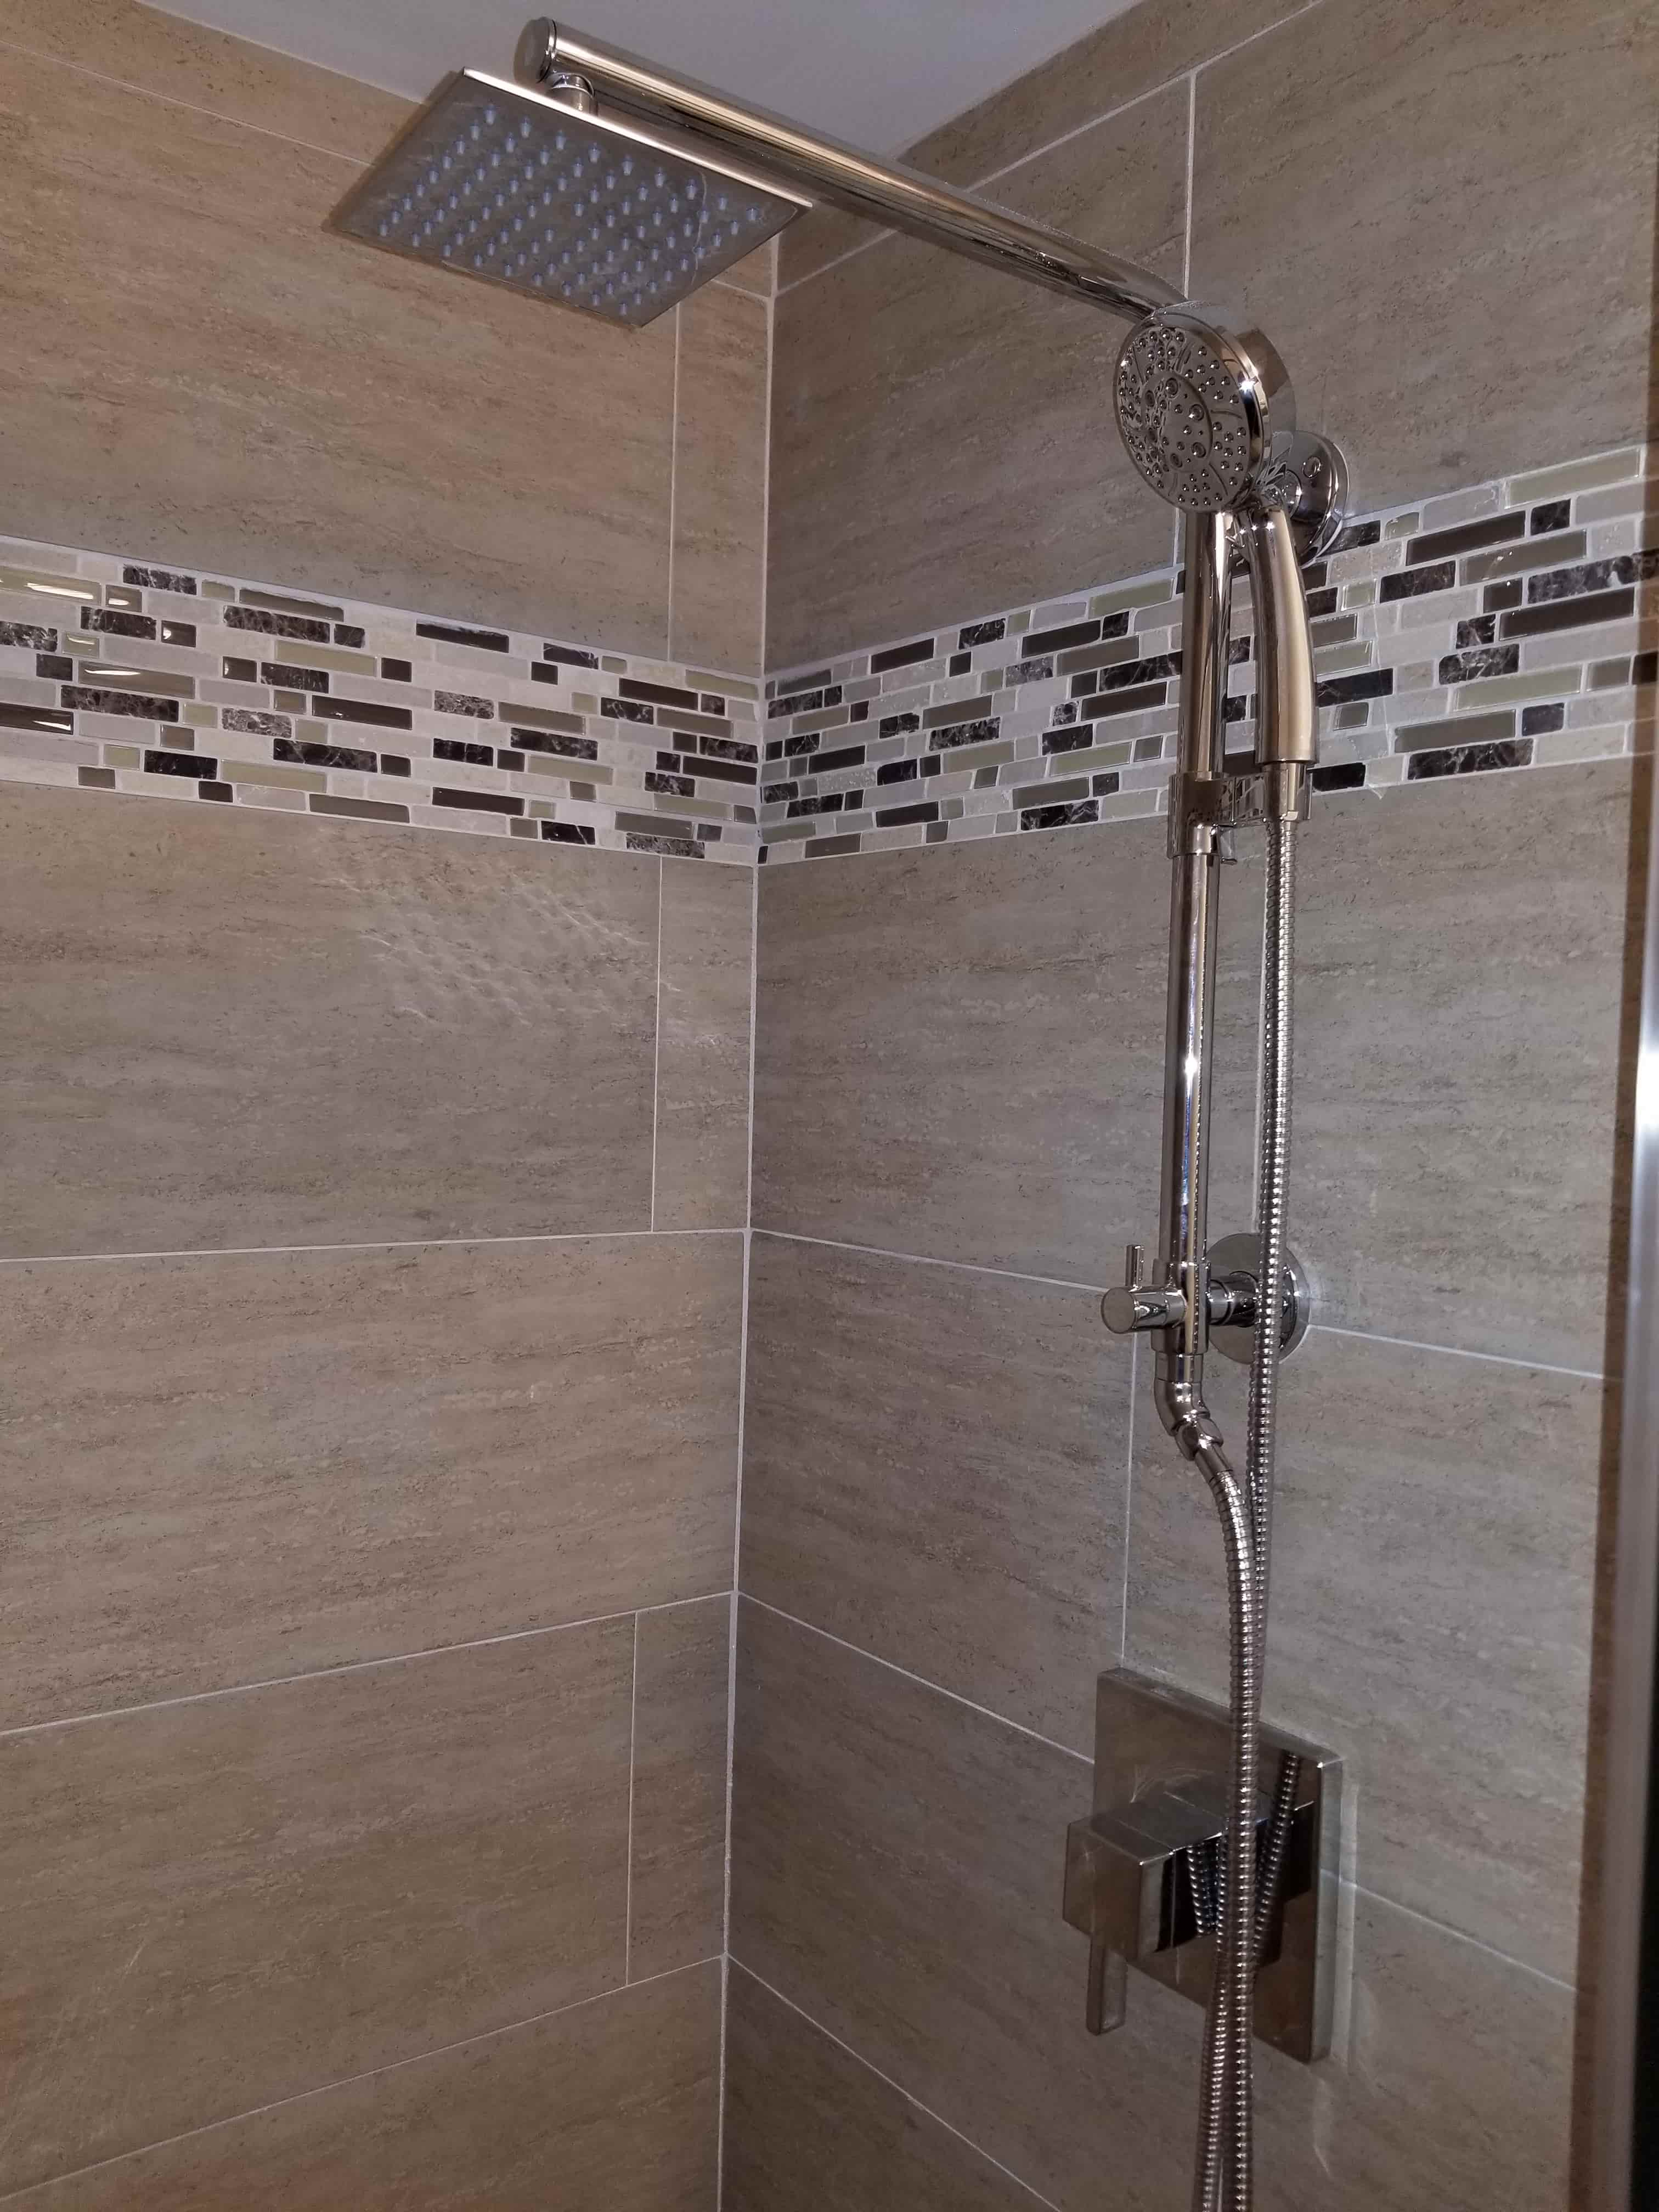 https://0201.nccdn.net/1_2/000/000/11c/675/Shower-min.jpg